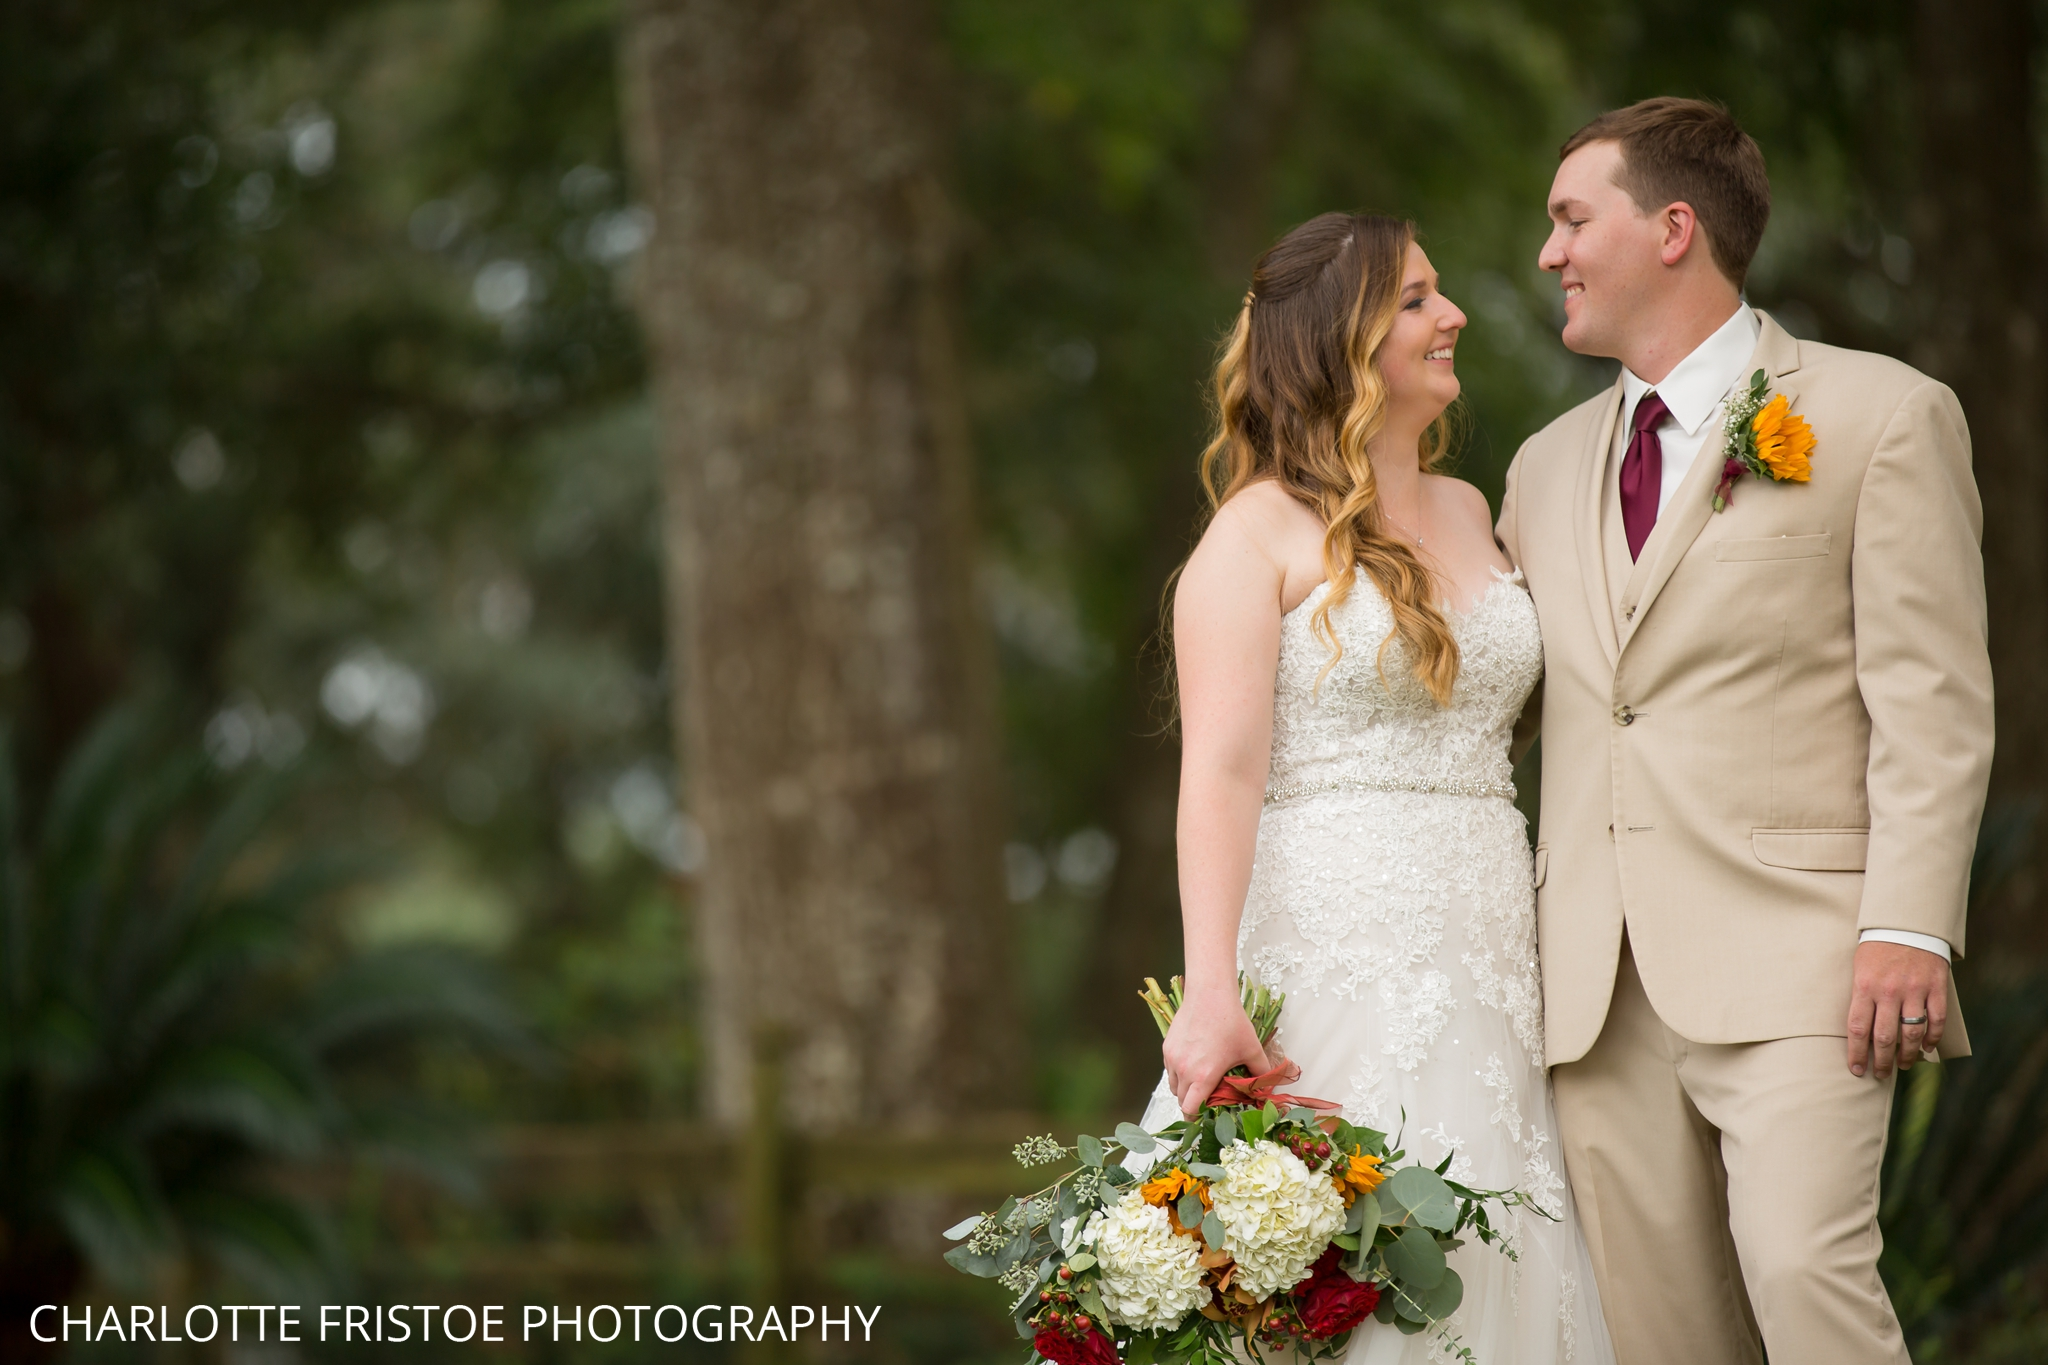 Tallahassee_Wedding_Charlotte_Fristoe-59.jpg